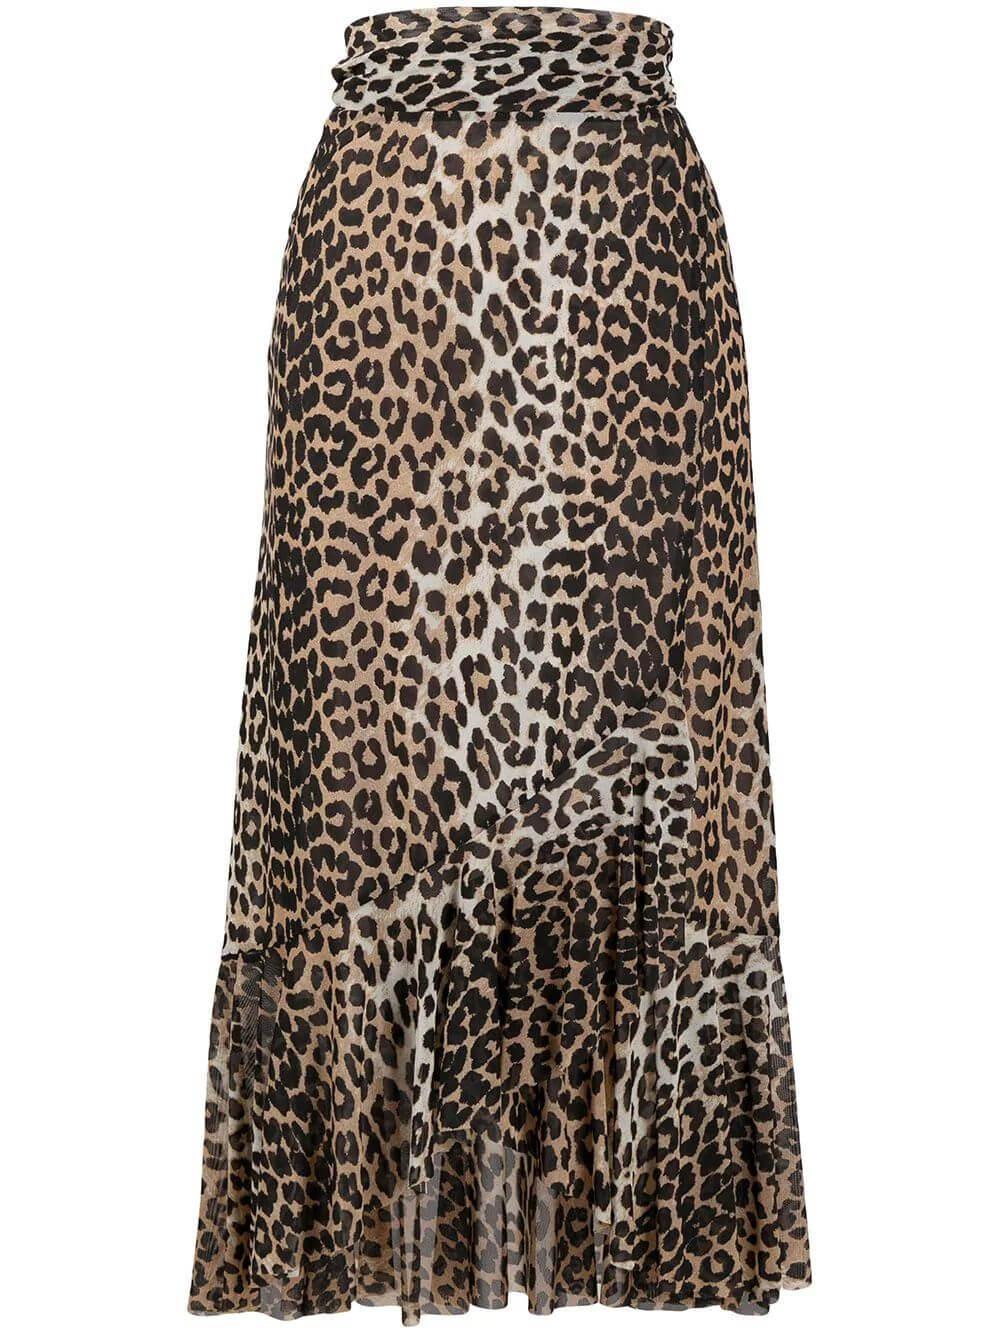 Leopard Print Mesh Wrap Skirt Item # T2701